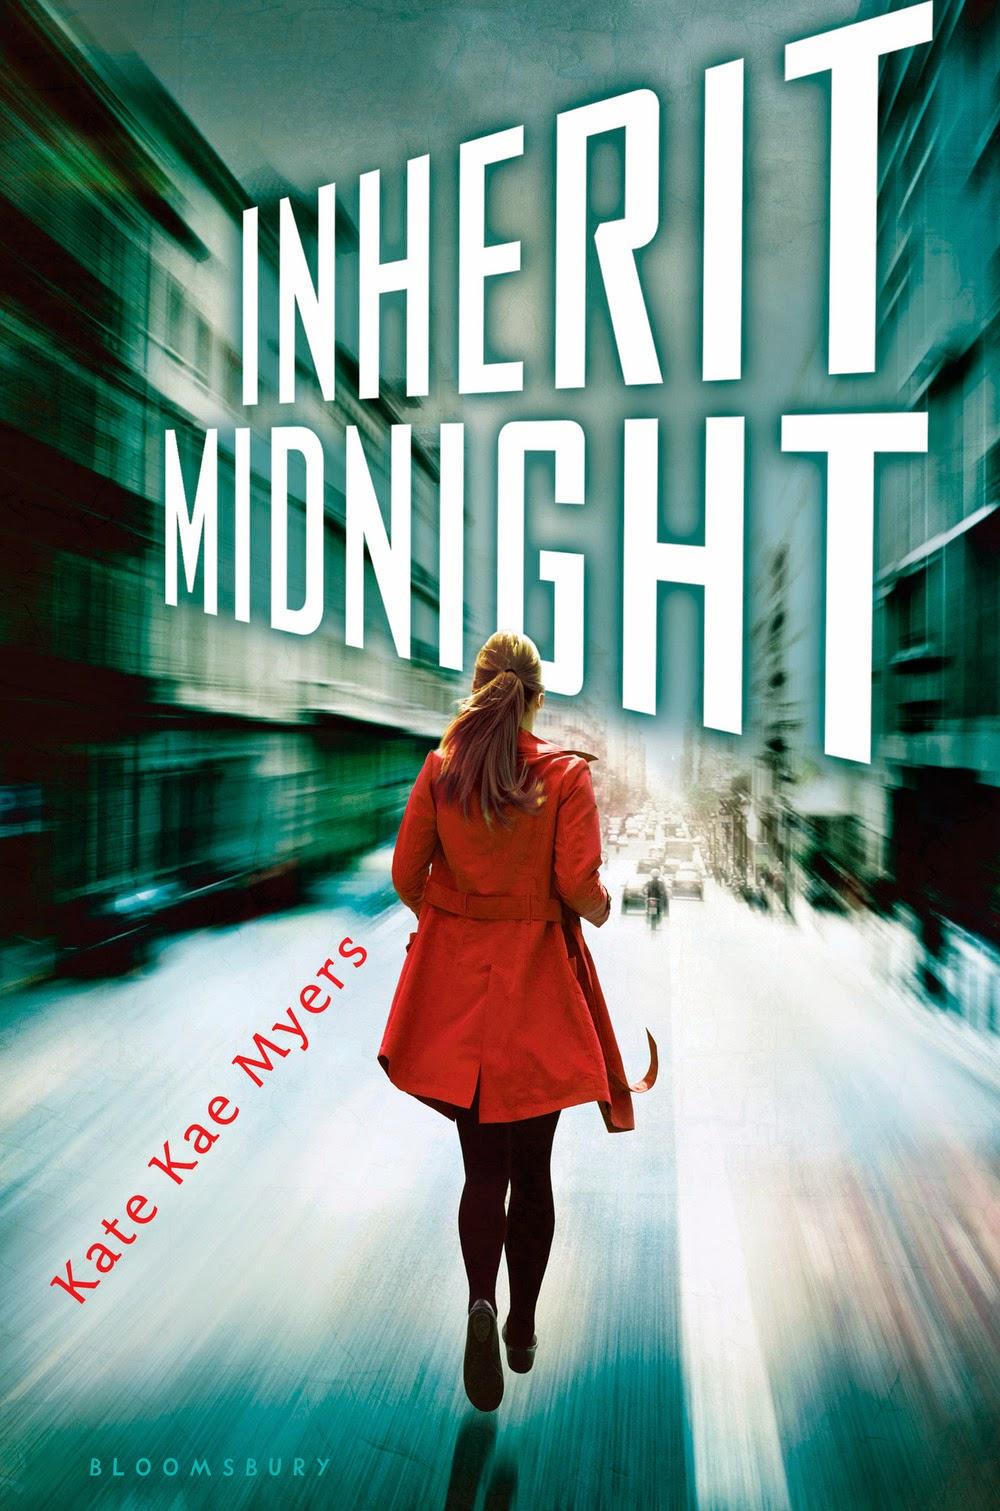 Inherit Midnight by Kate Kae Myers